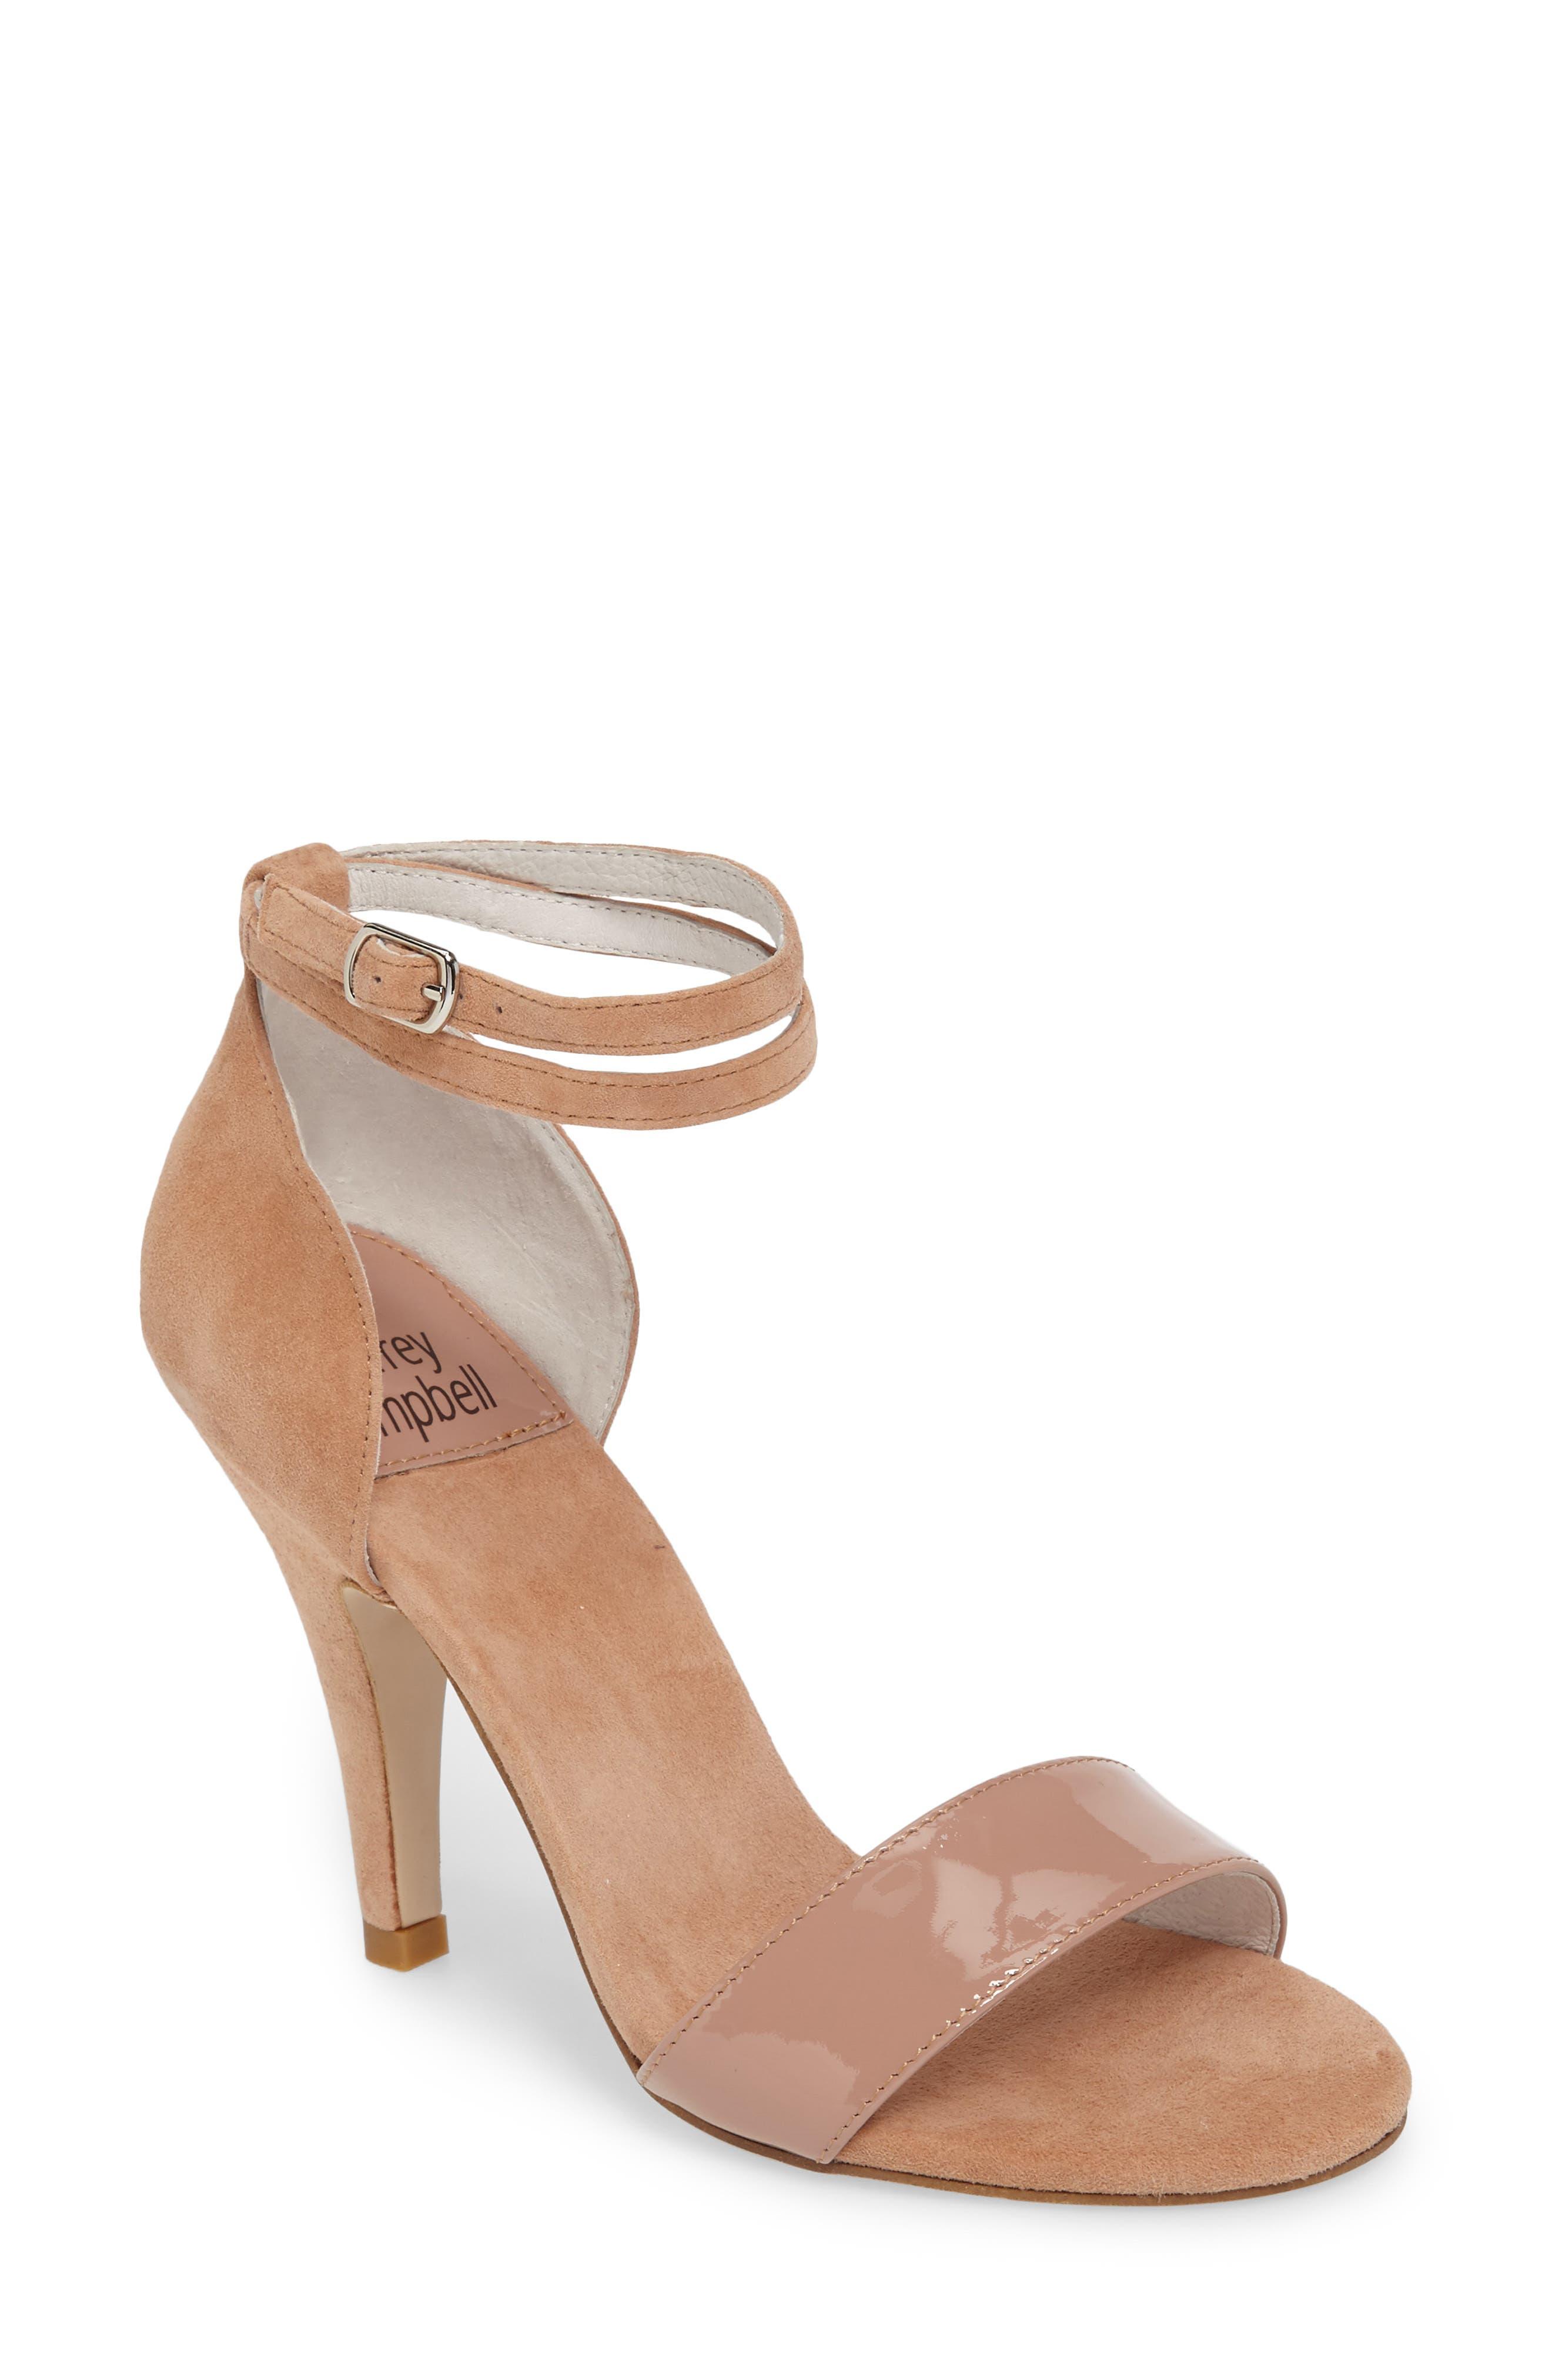 Main Image - Jeffrey Campbell Kristy Ankle Strap Sandal (Women)